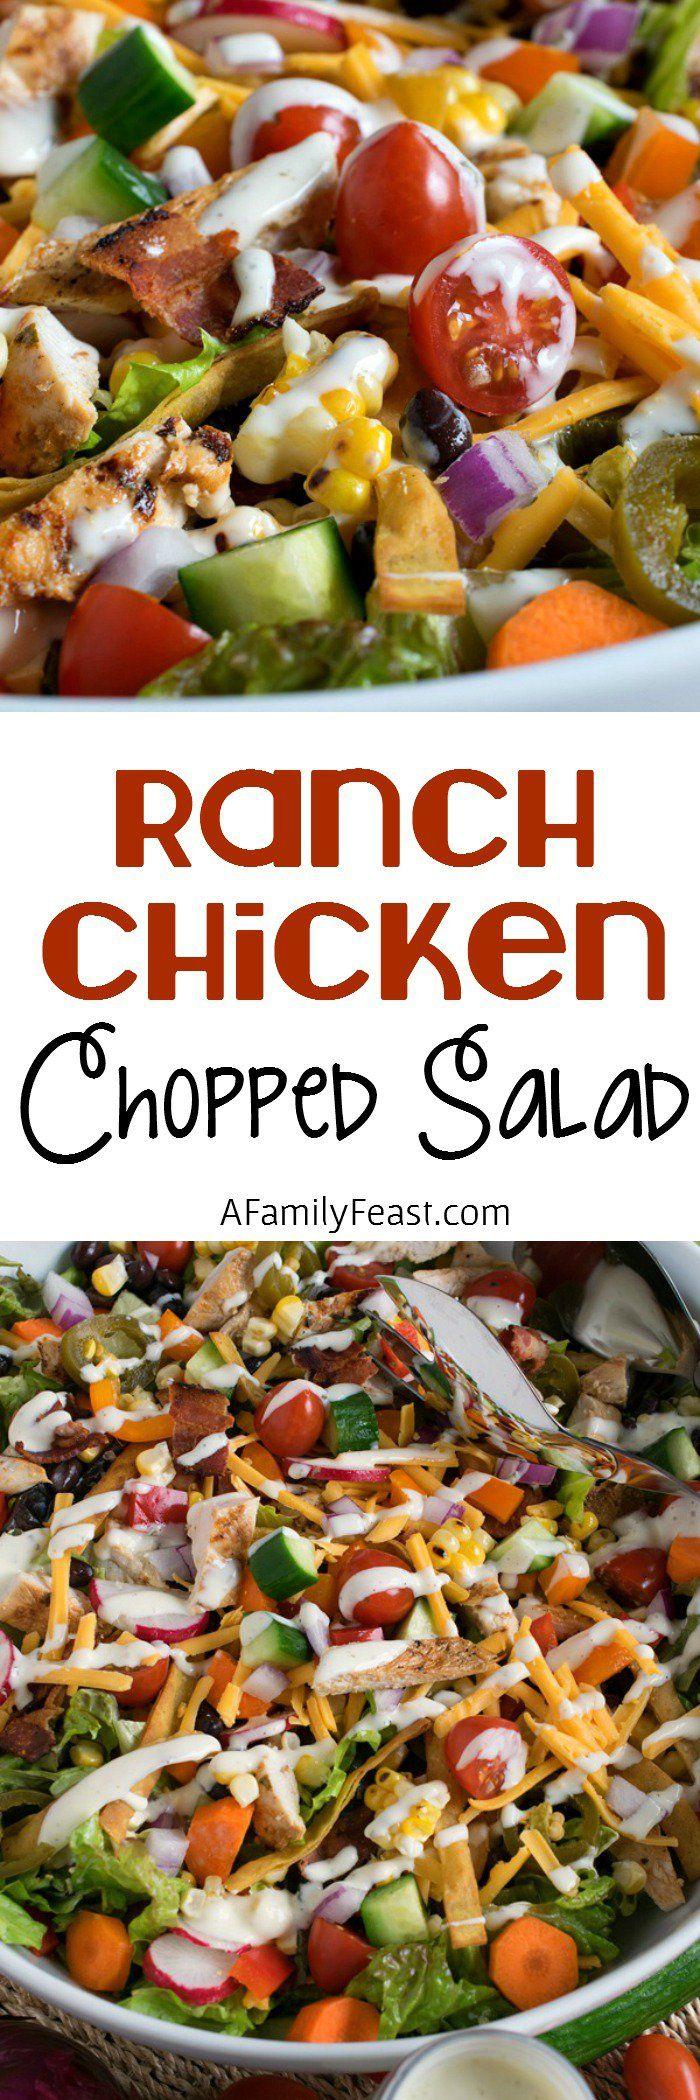 Ranch Chicken Chopped Salad